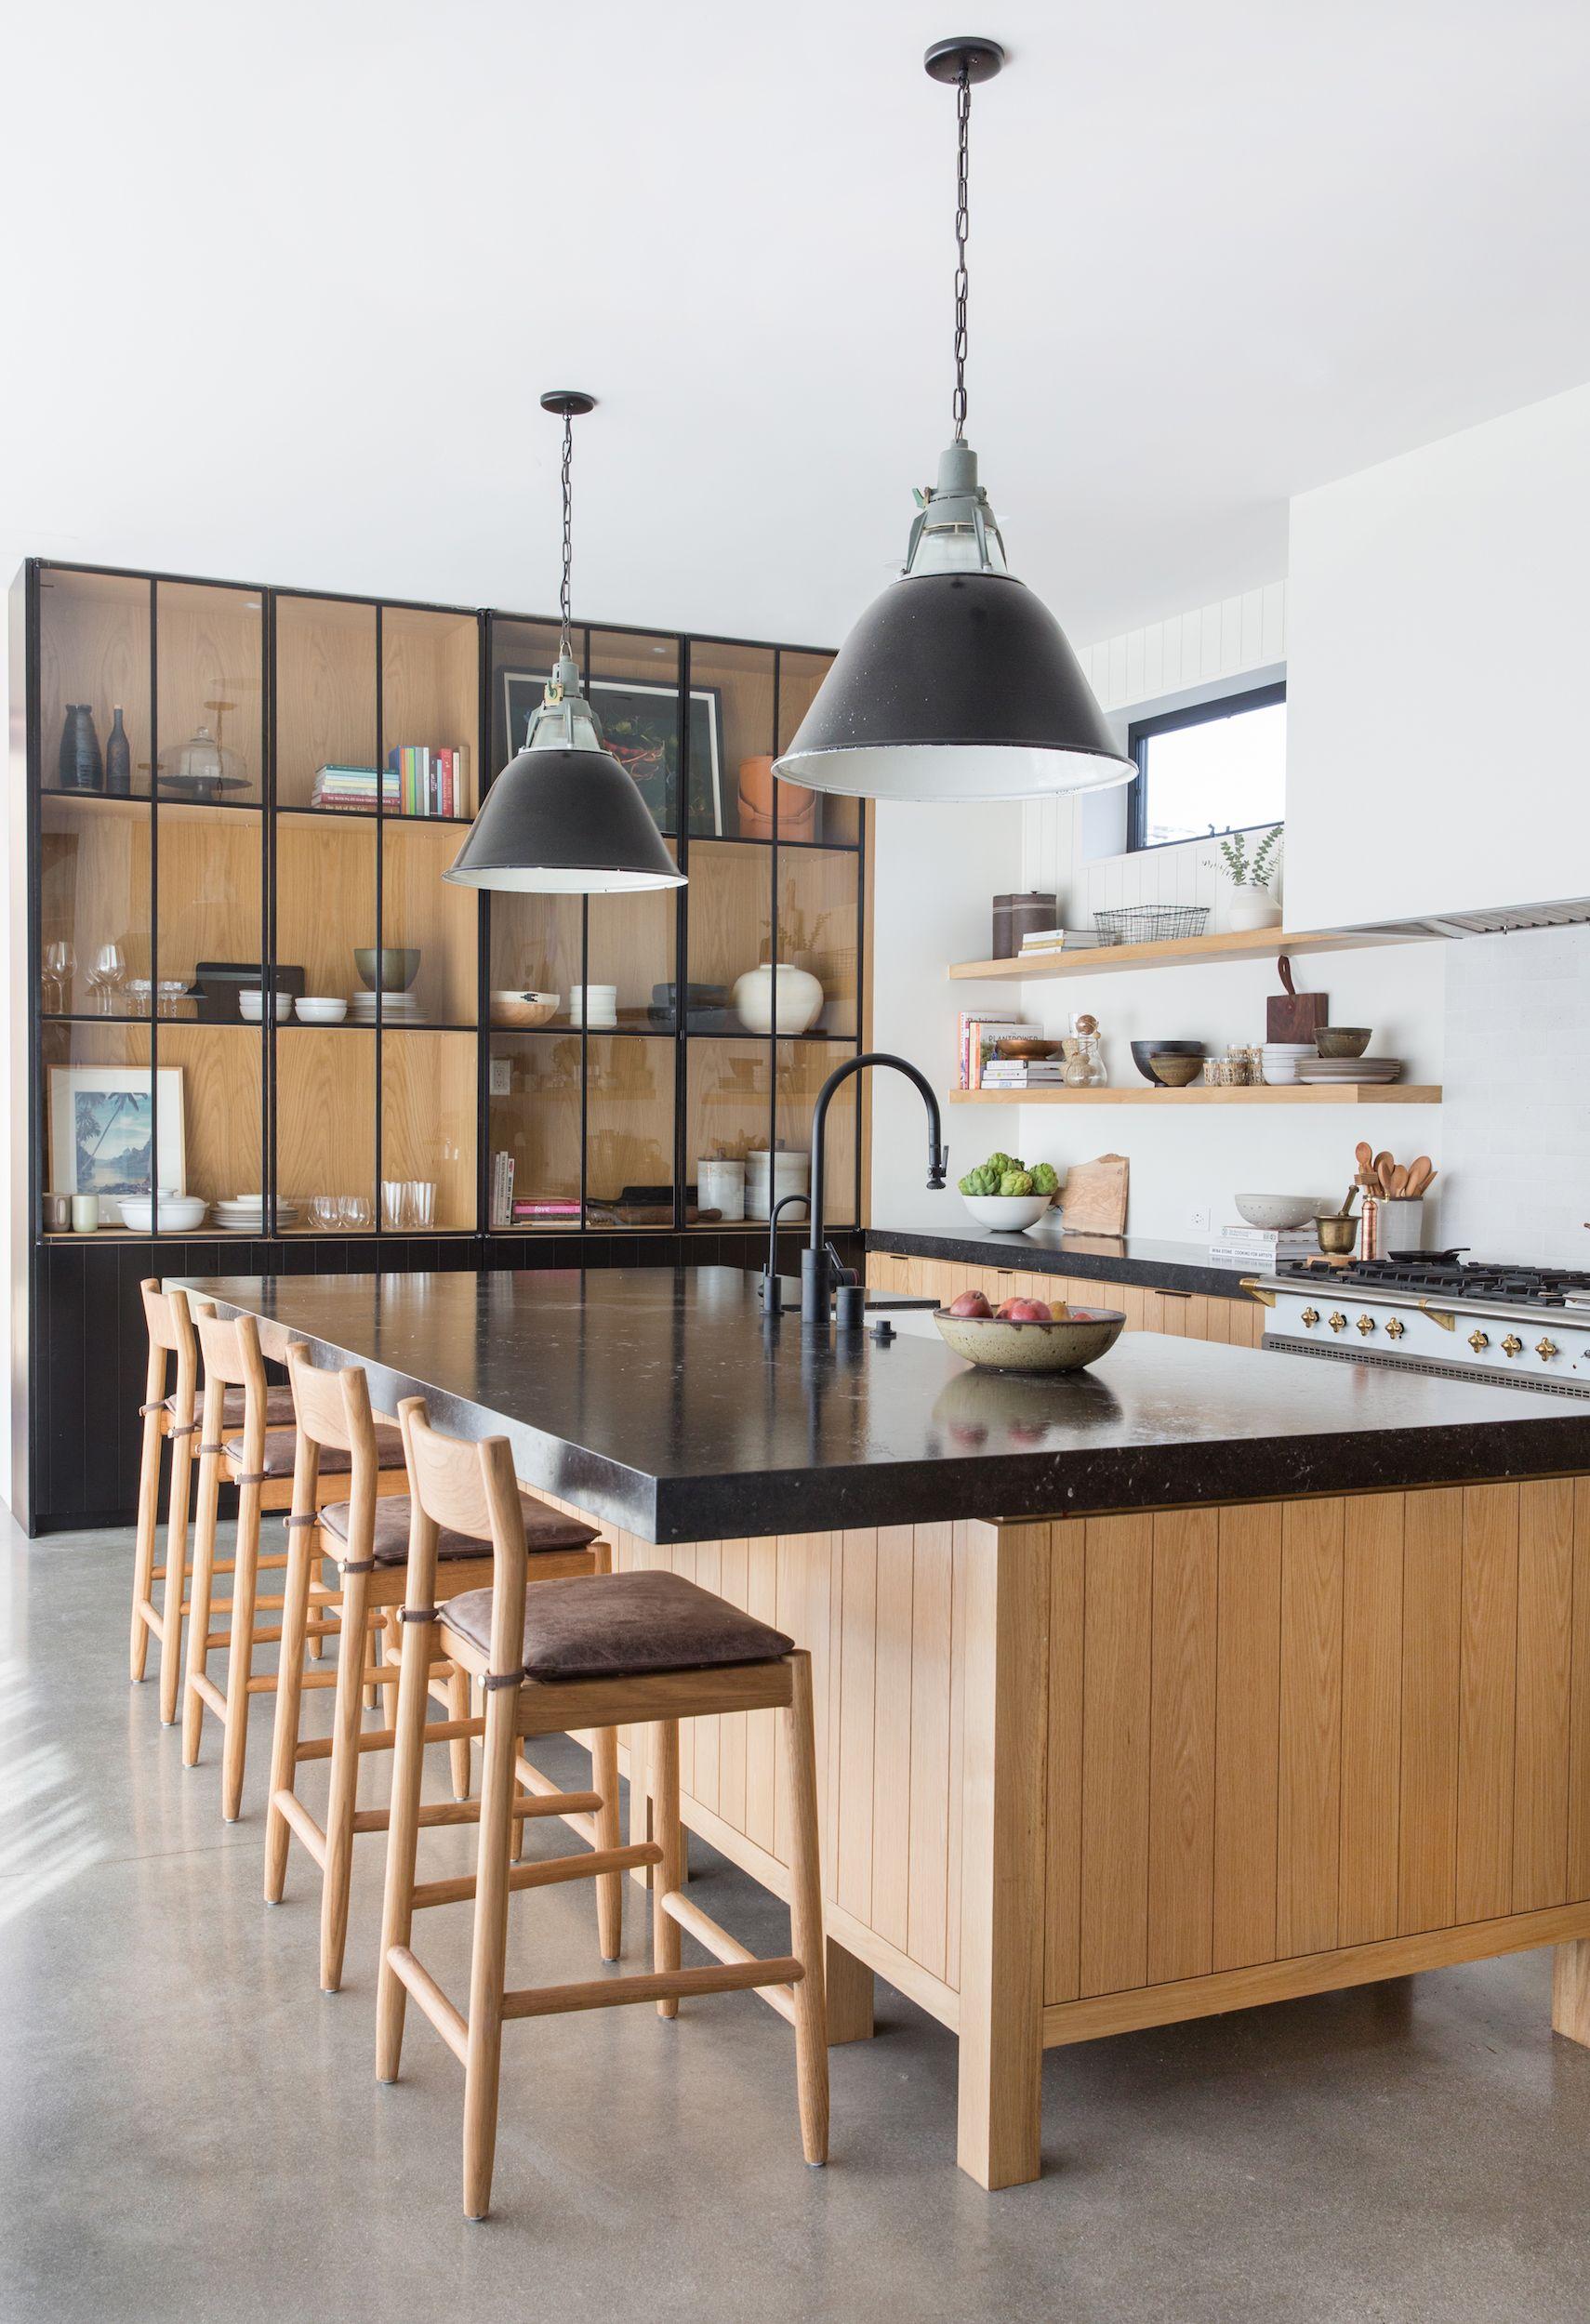 Image of: 11 Black Kitchens Black Cabinet And Backsplash Ideas